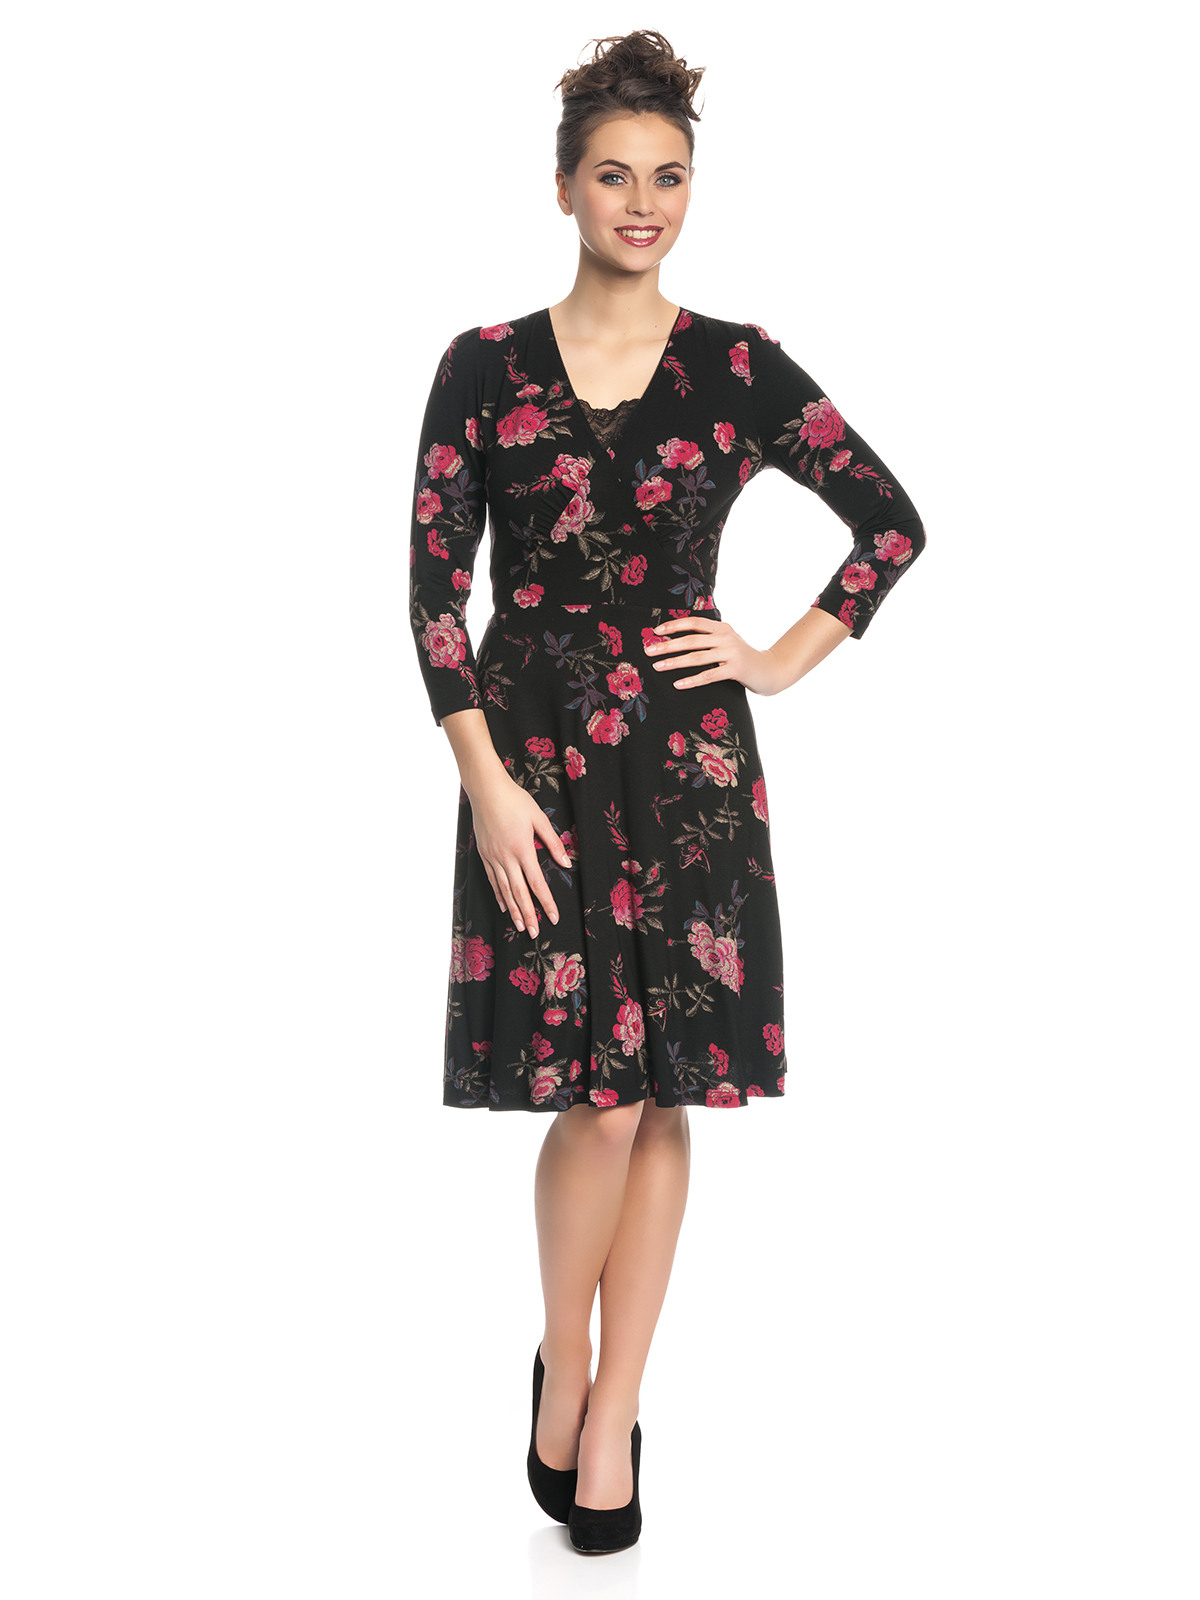 Vive Maria Victorian Girl Dress Black Allover Clothing Dresses